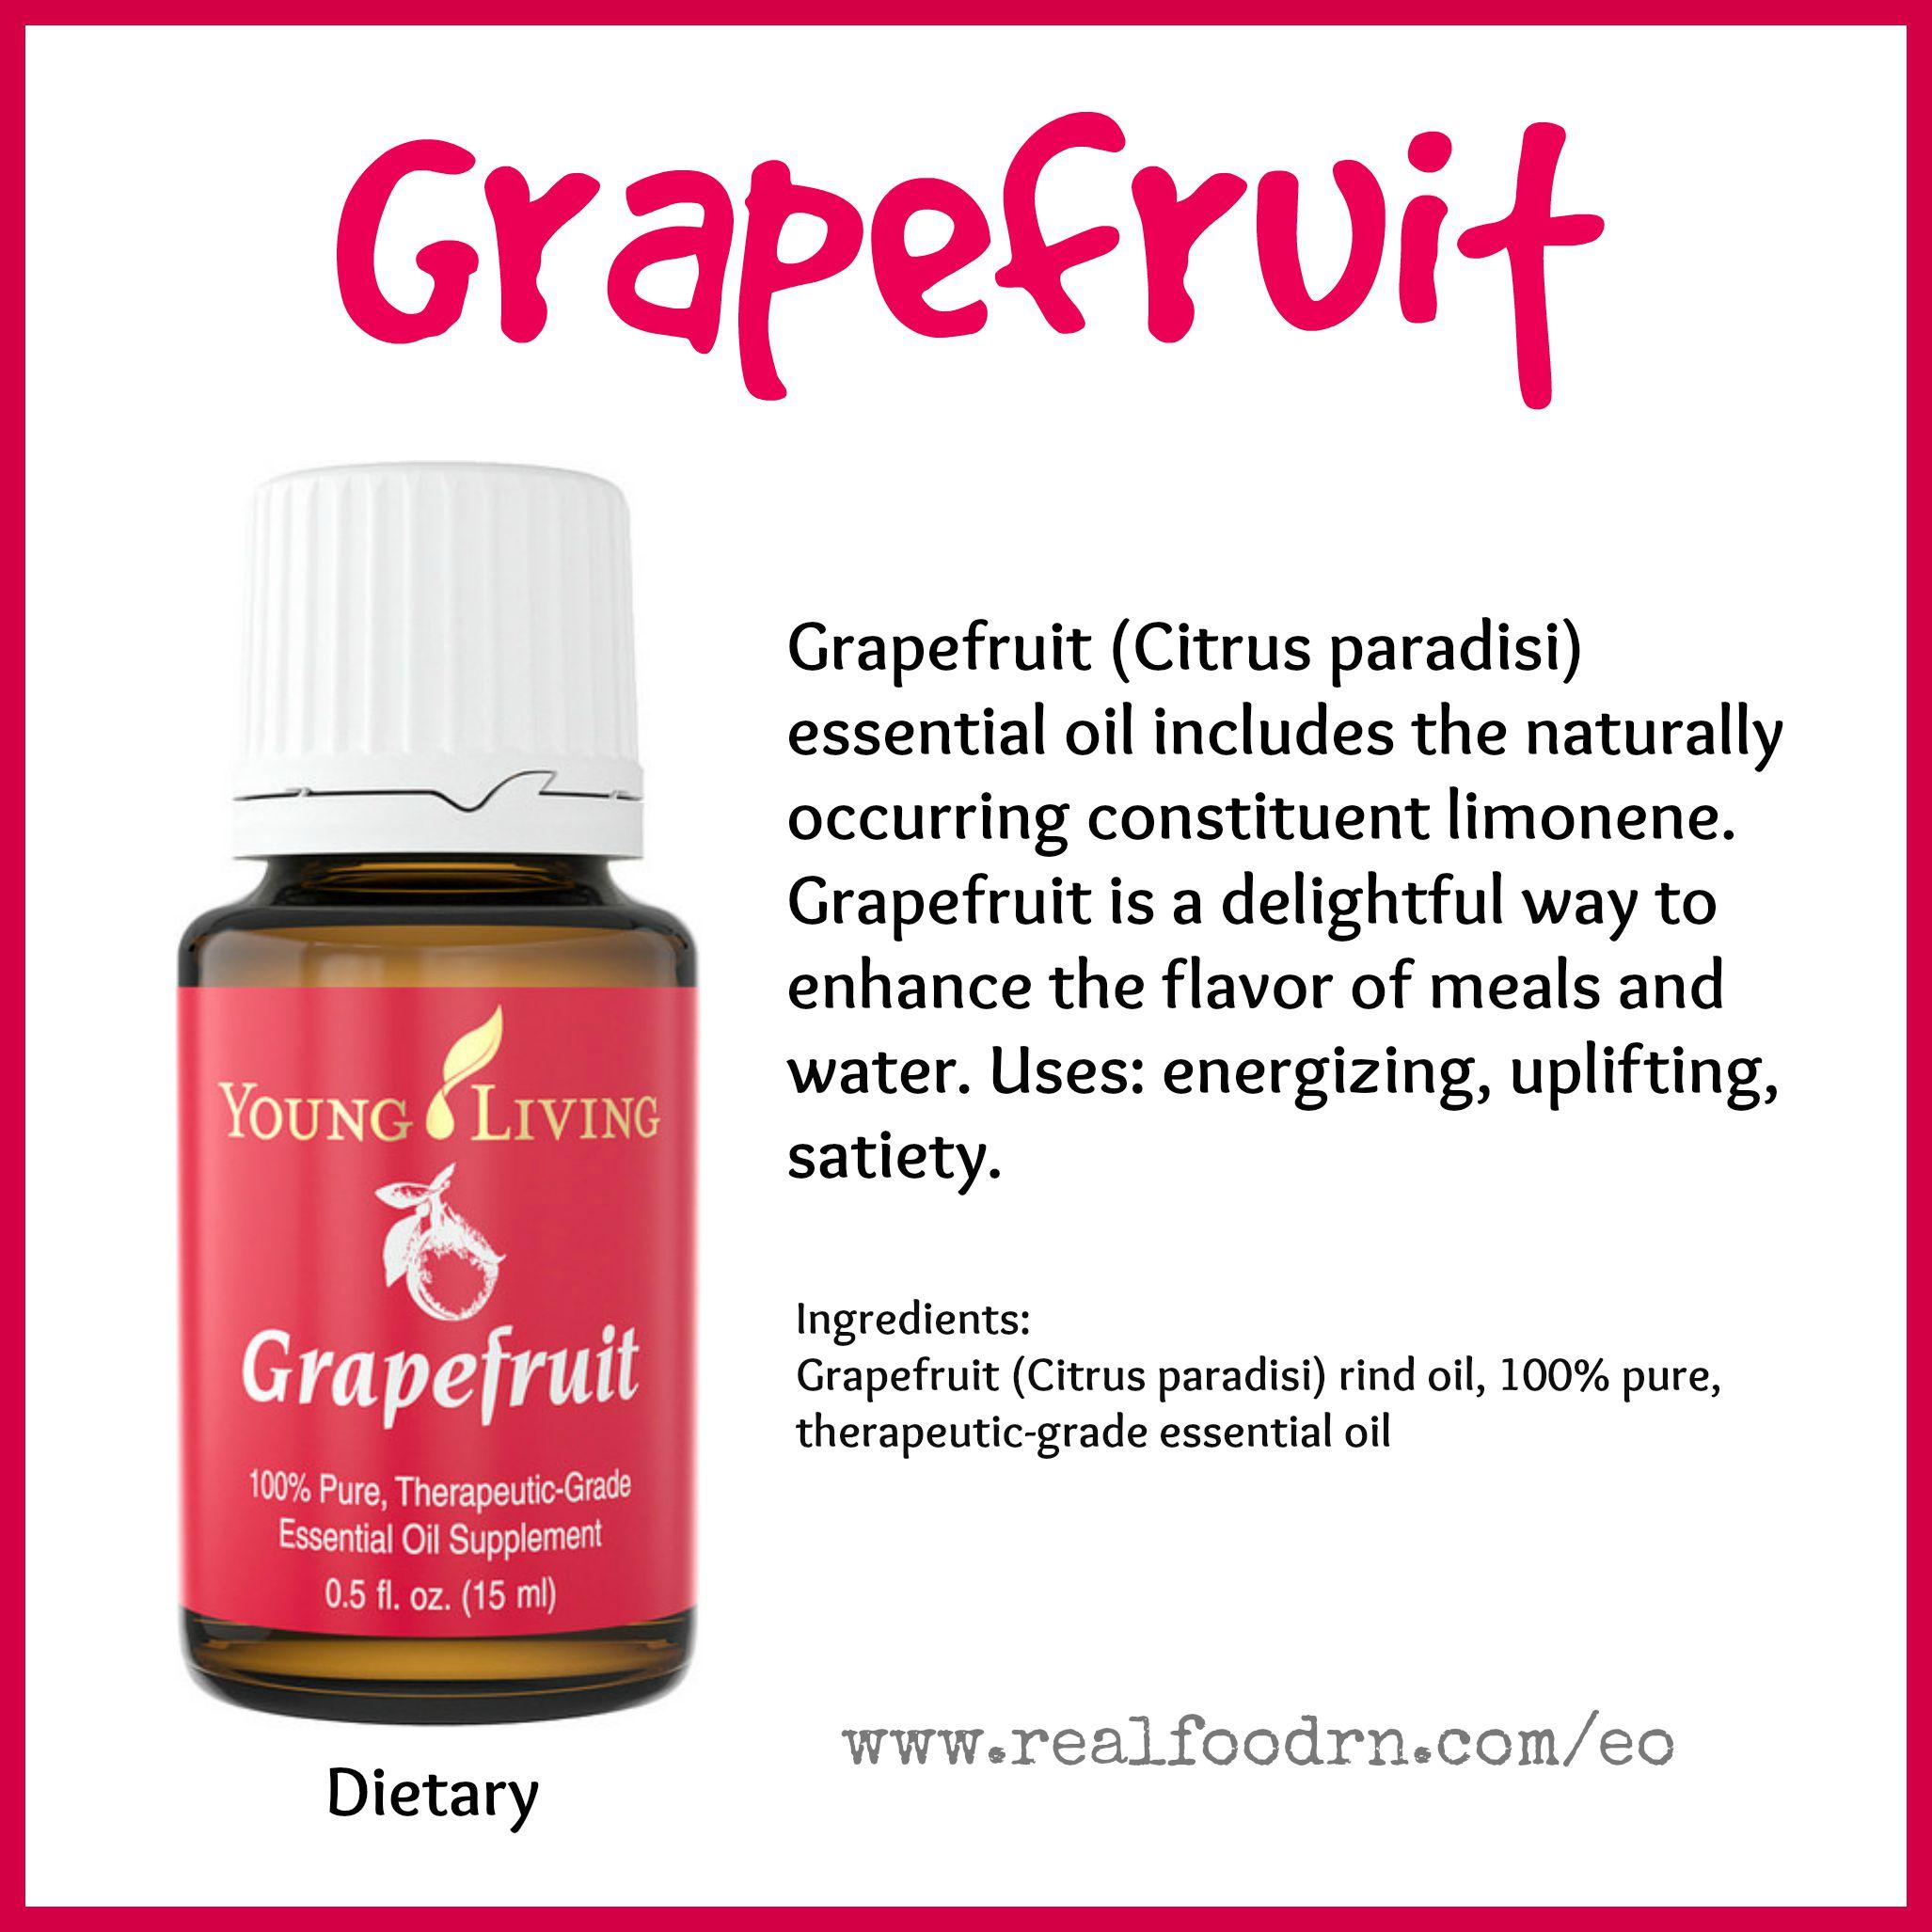 Grapefruit Essential Oil Real Food Rn